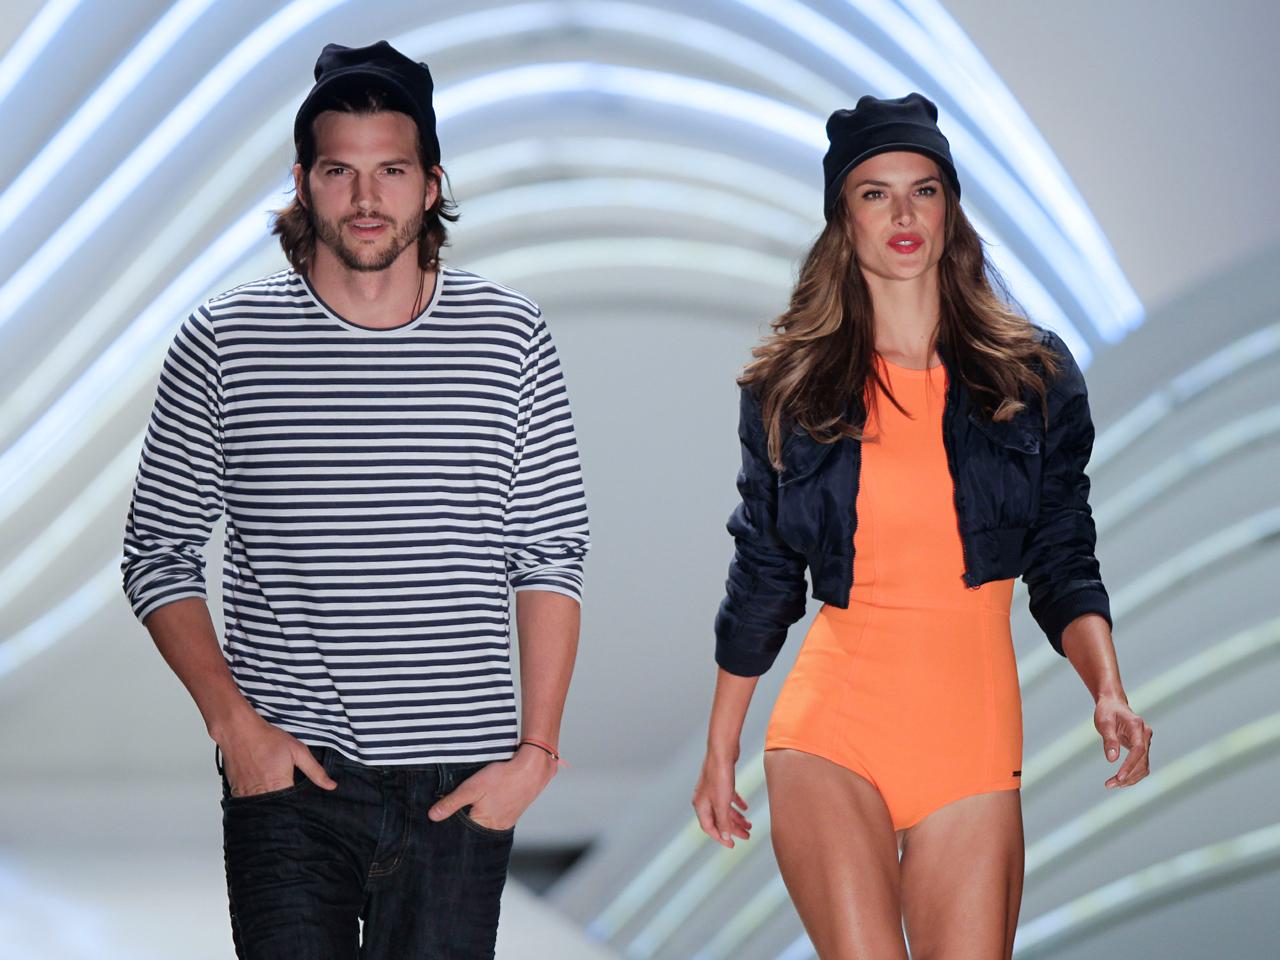 Asthon Kutcher Hits The Catwalk At Sao Paulo Fashion Week Cbs News